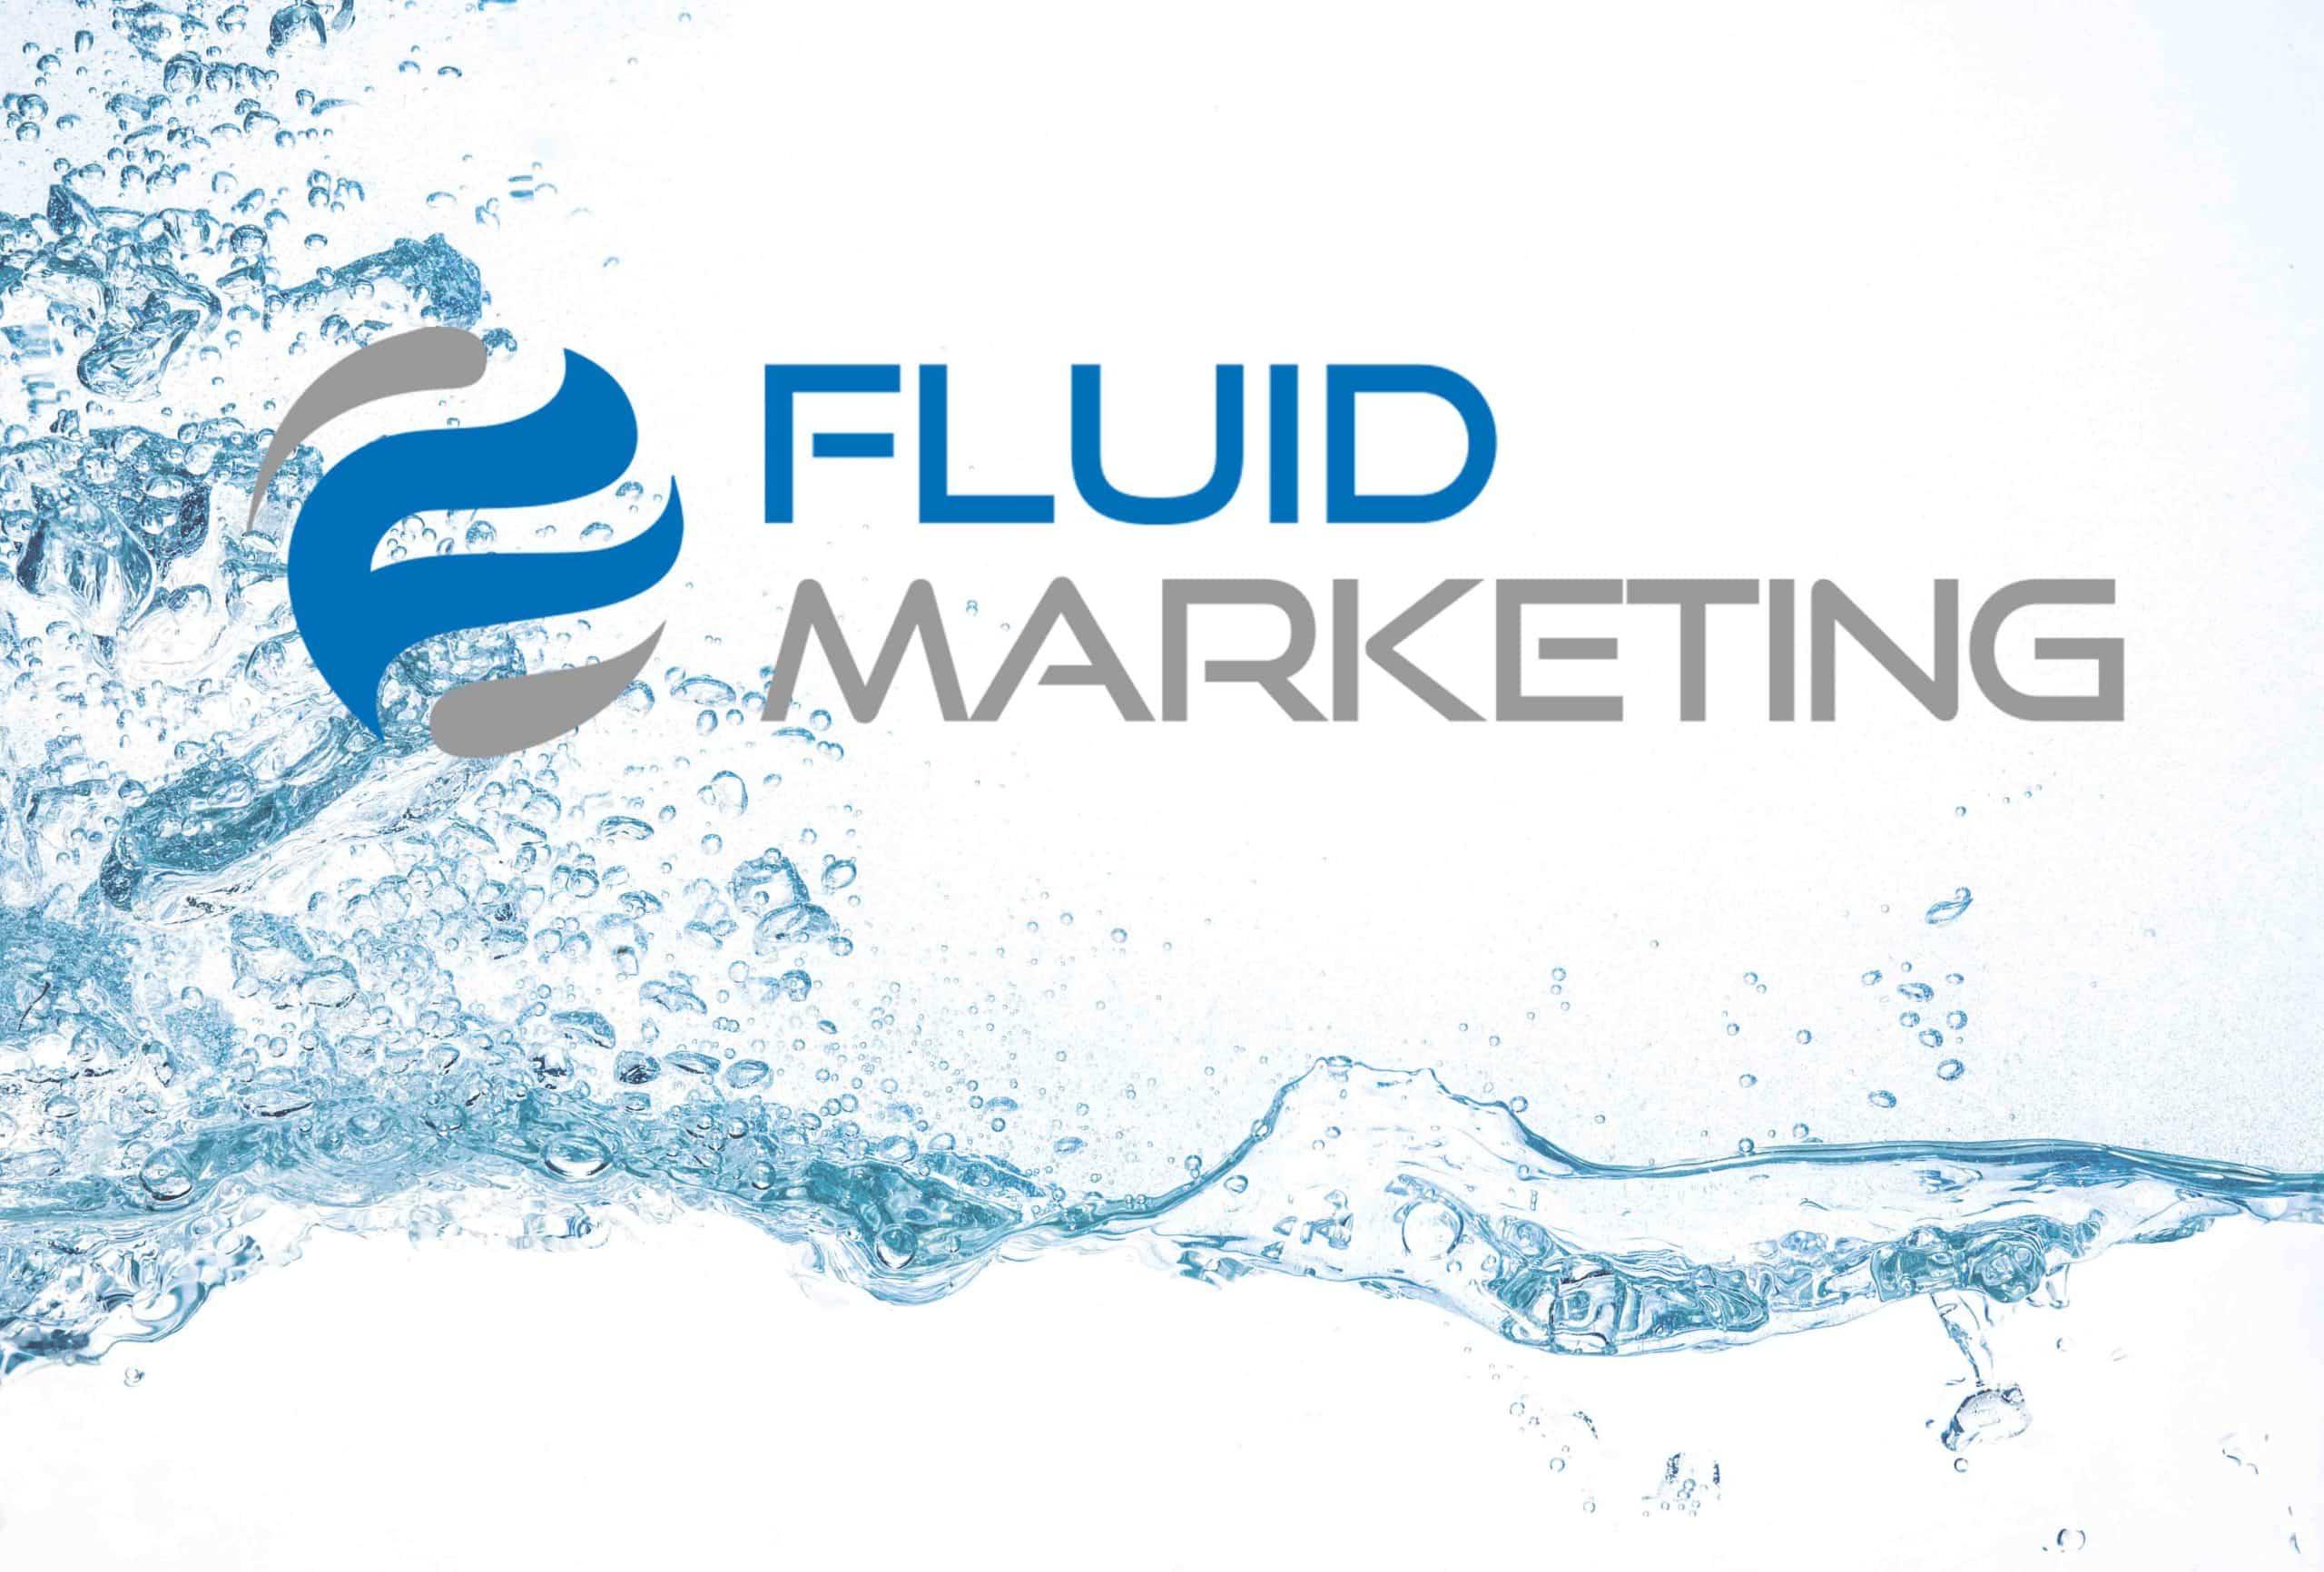 fluid marketing